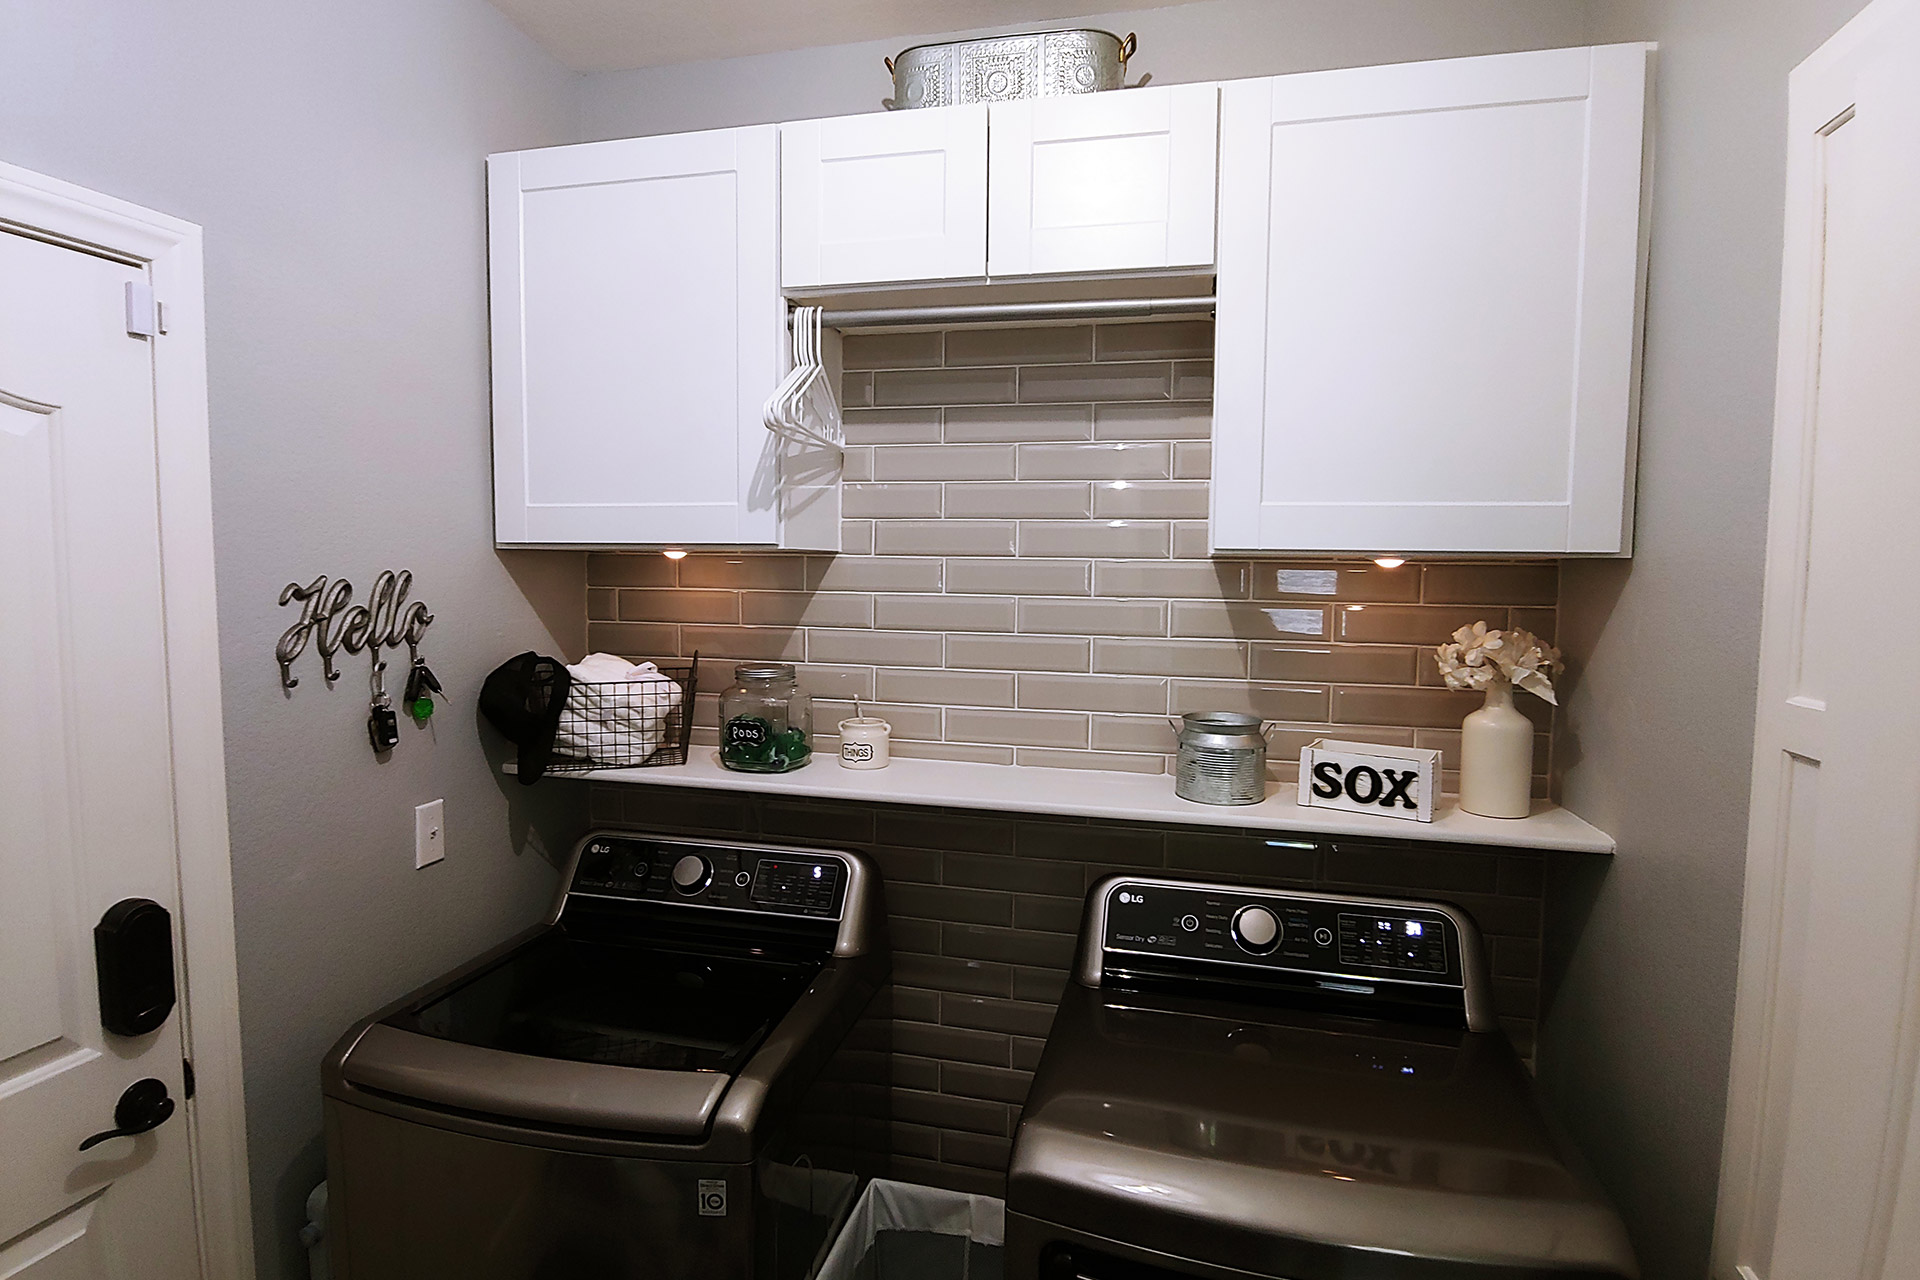 View Laundry Room Backsplash Installation